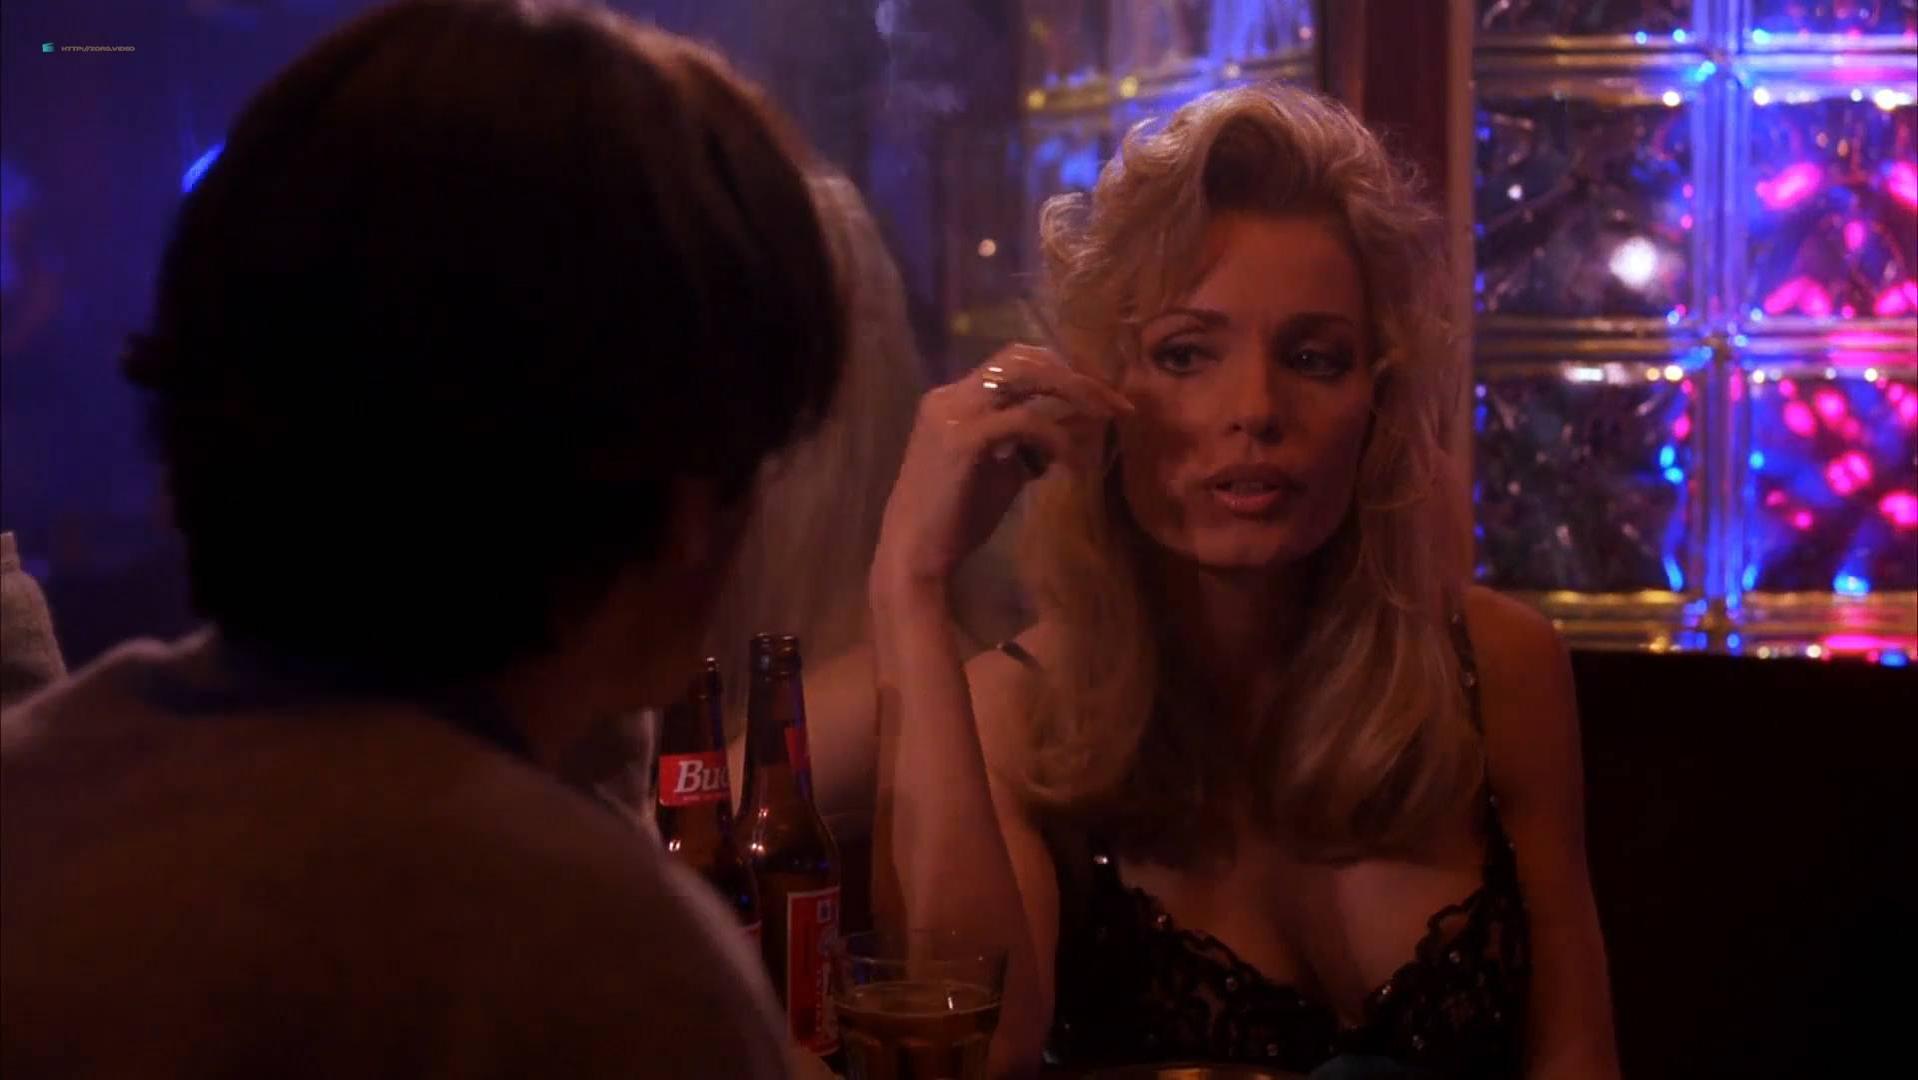 Mimi Craven nude - Last Dance (1996)